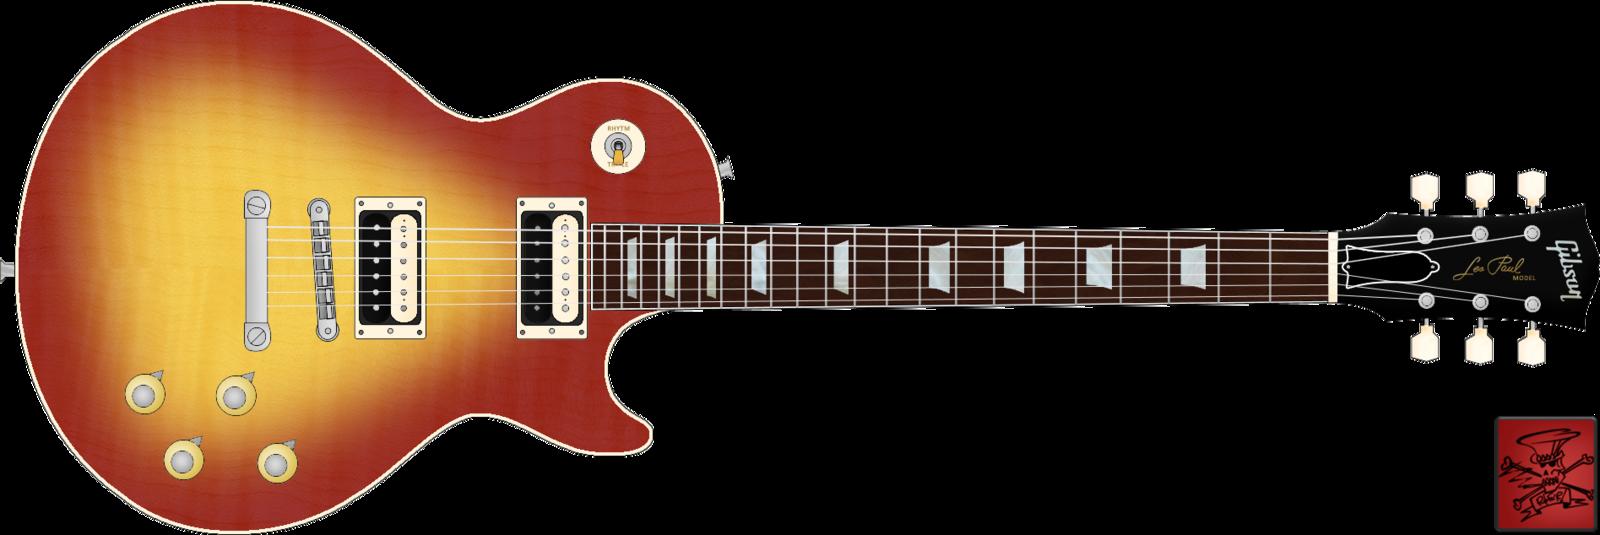 Clipart guitar octavina. Les paul drawing at